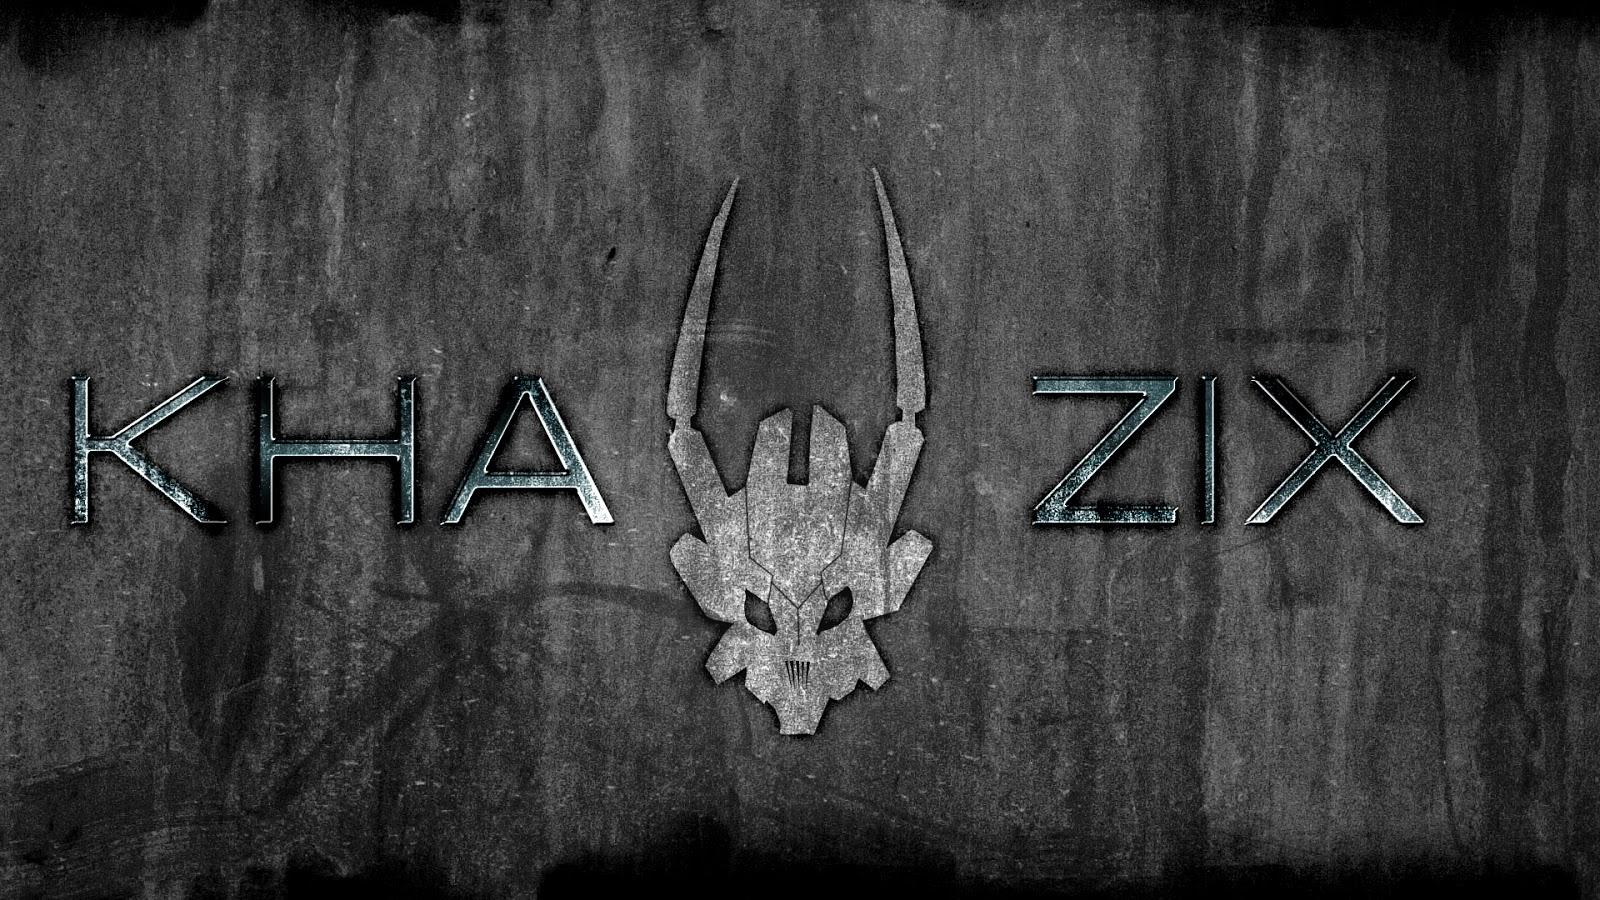 http://2.bp.blogspot.com/-QzfWSs8gAAI/UPXX6-PjB9I/AAAAAAAAAbc/qWZvc8DctSU/s1600/Kha\'zix.jpg